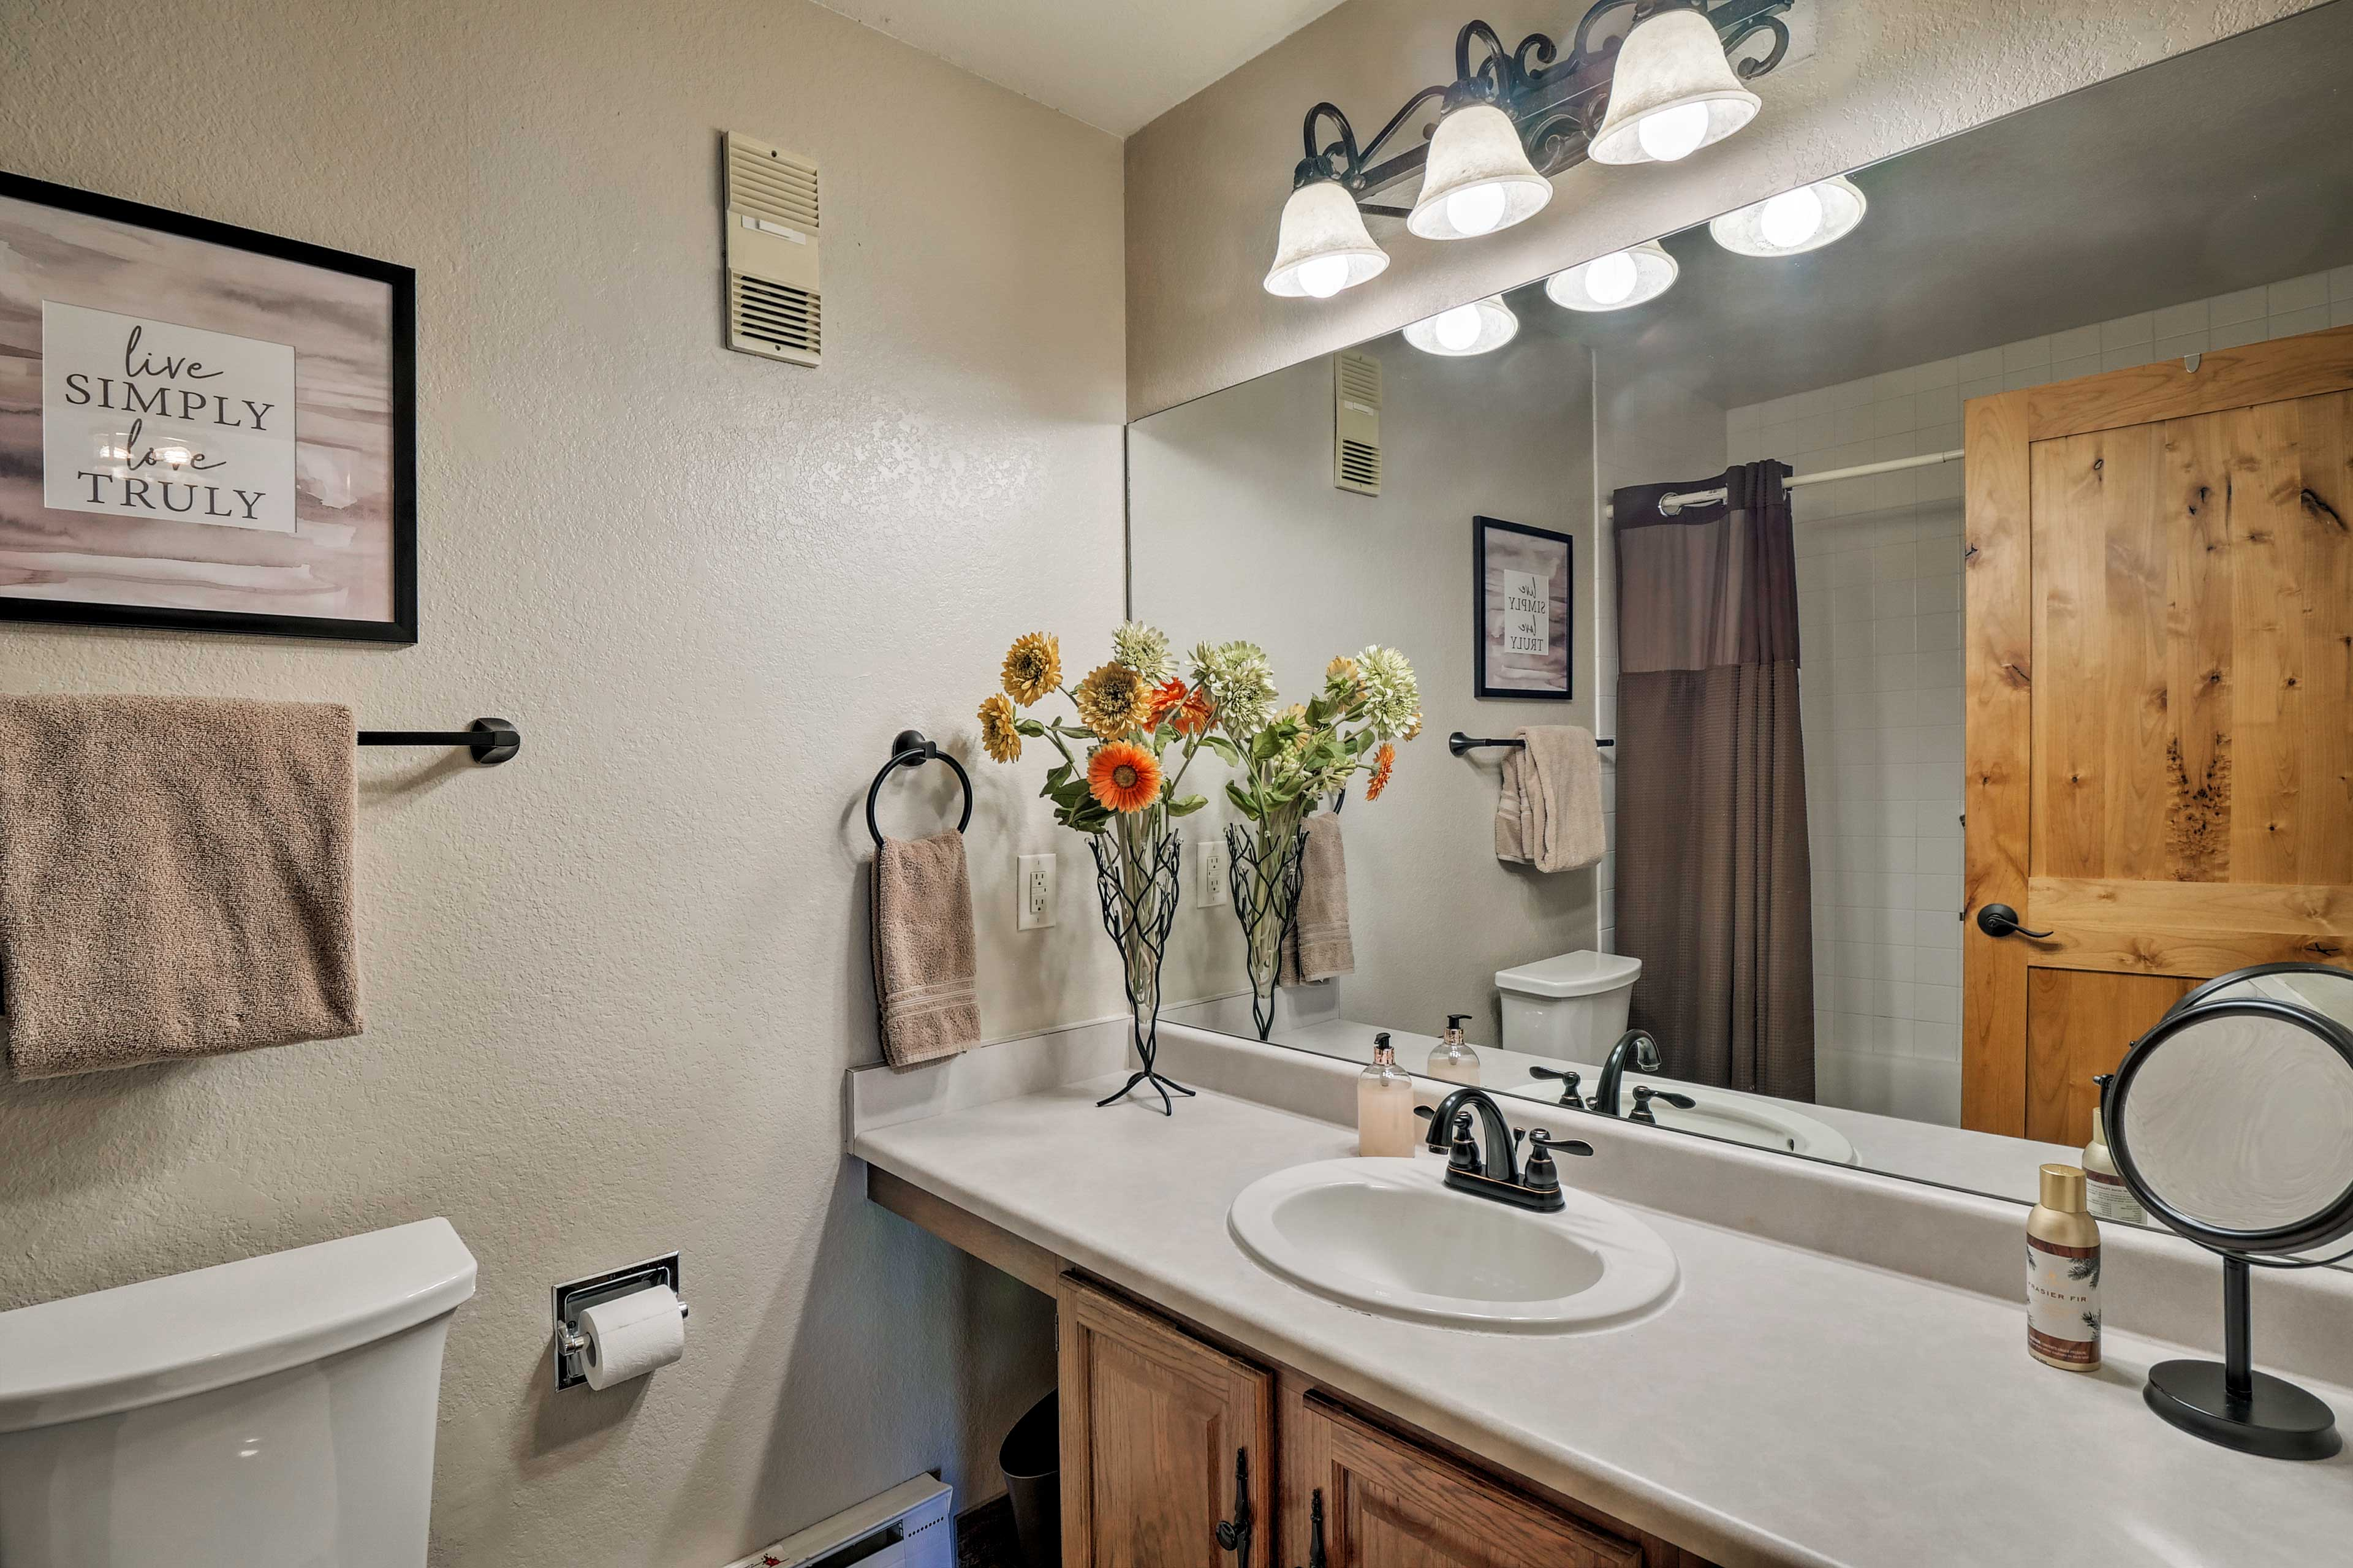 Get ready for bed in the en-suite bathroom.